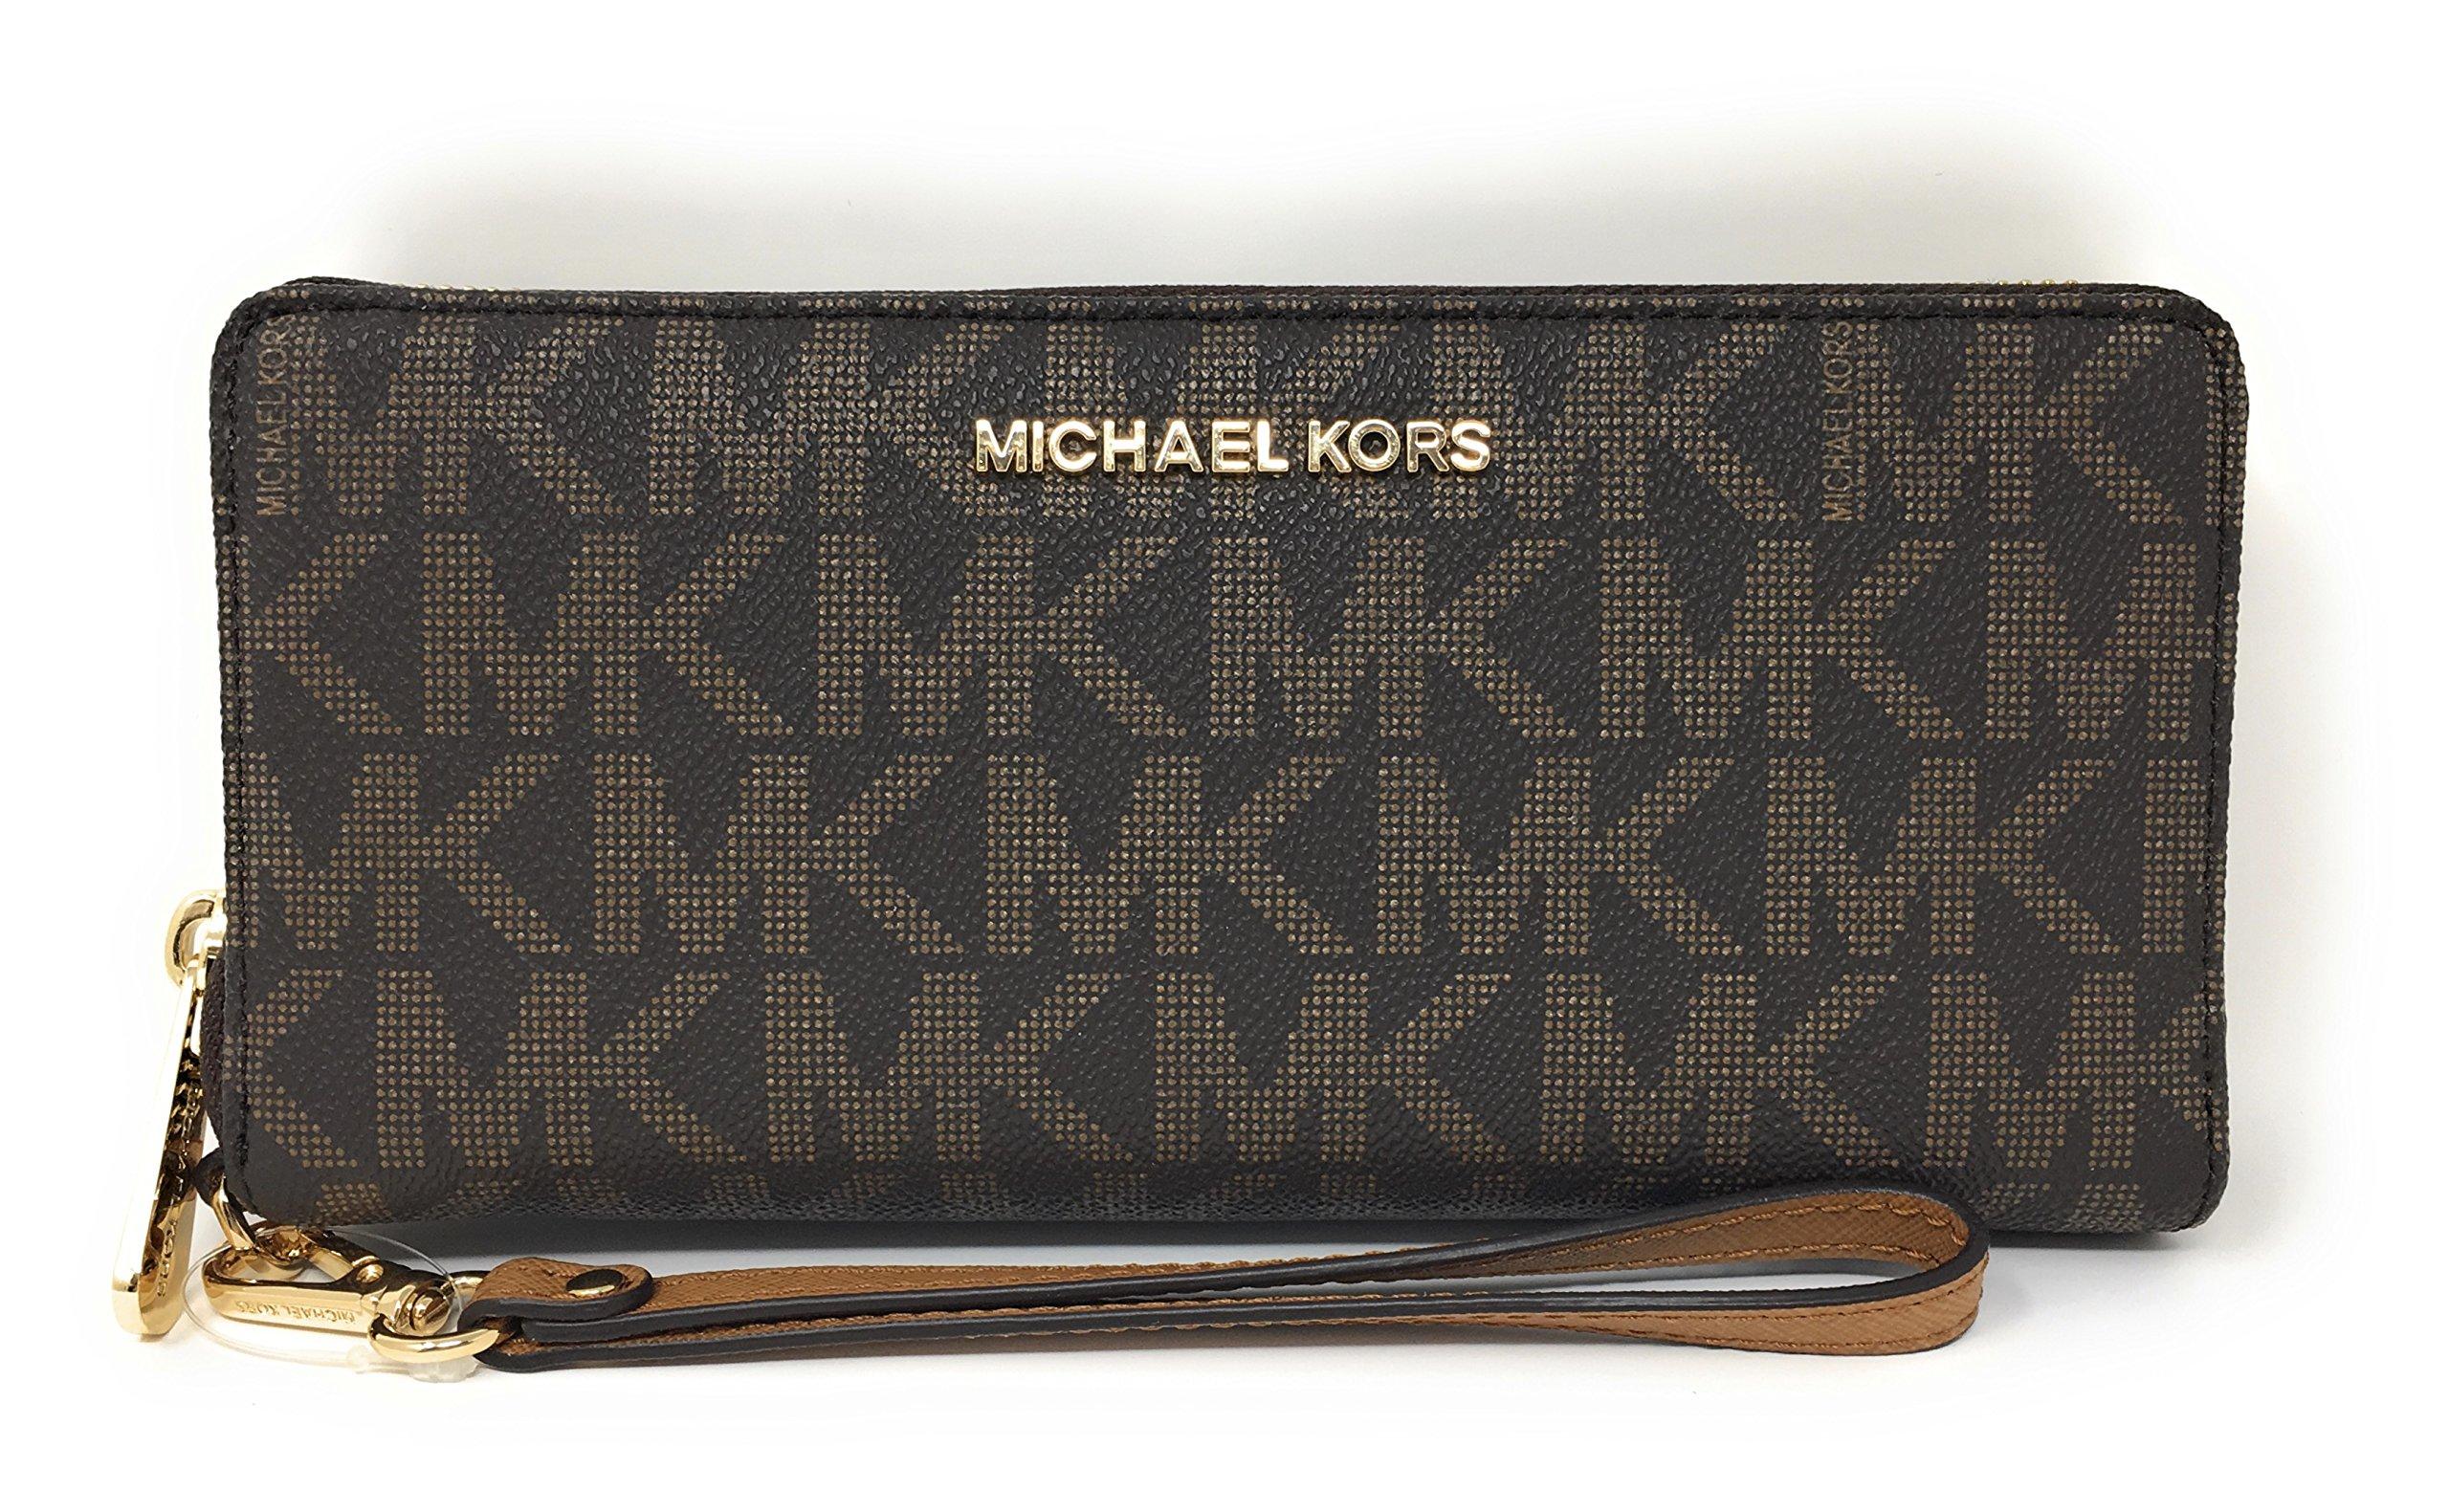 Michael Kors Jet Set Travel Monogram Zip Around Travel Wallet Wristlet (Brown / Acorn)